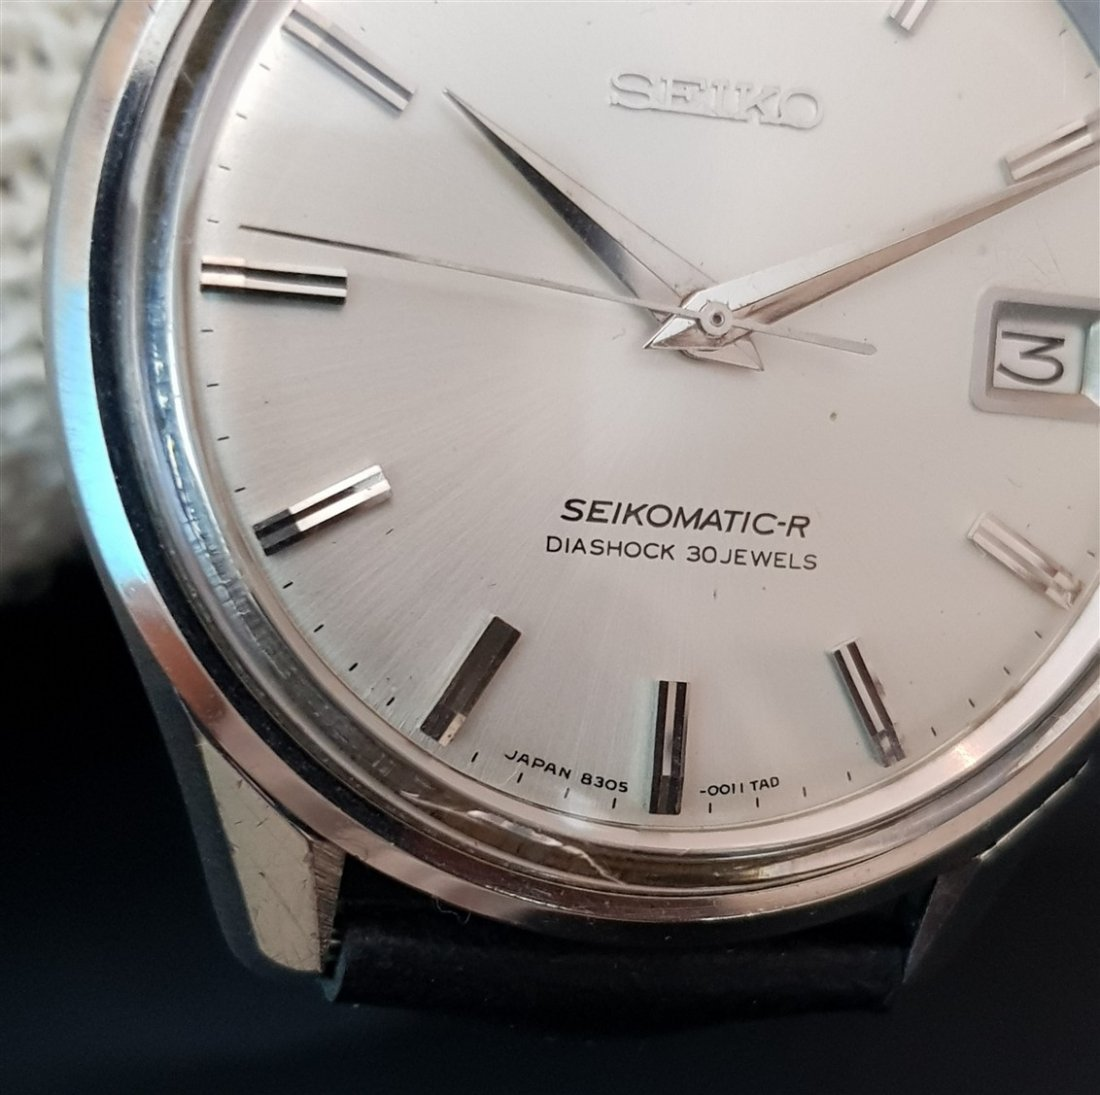 Rare 1960's Seikomatic-R  Diashock 30 Jewels Japan - 3